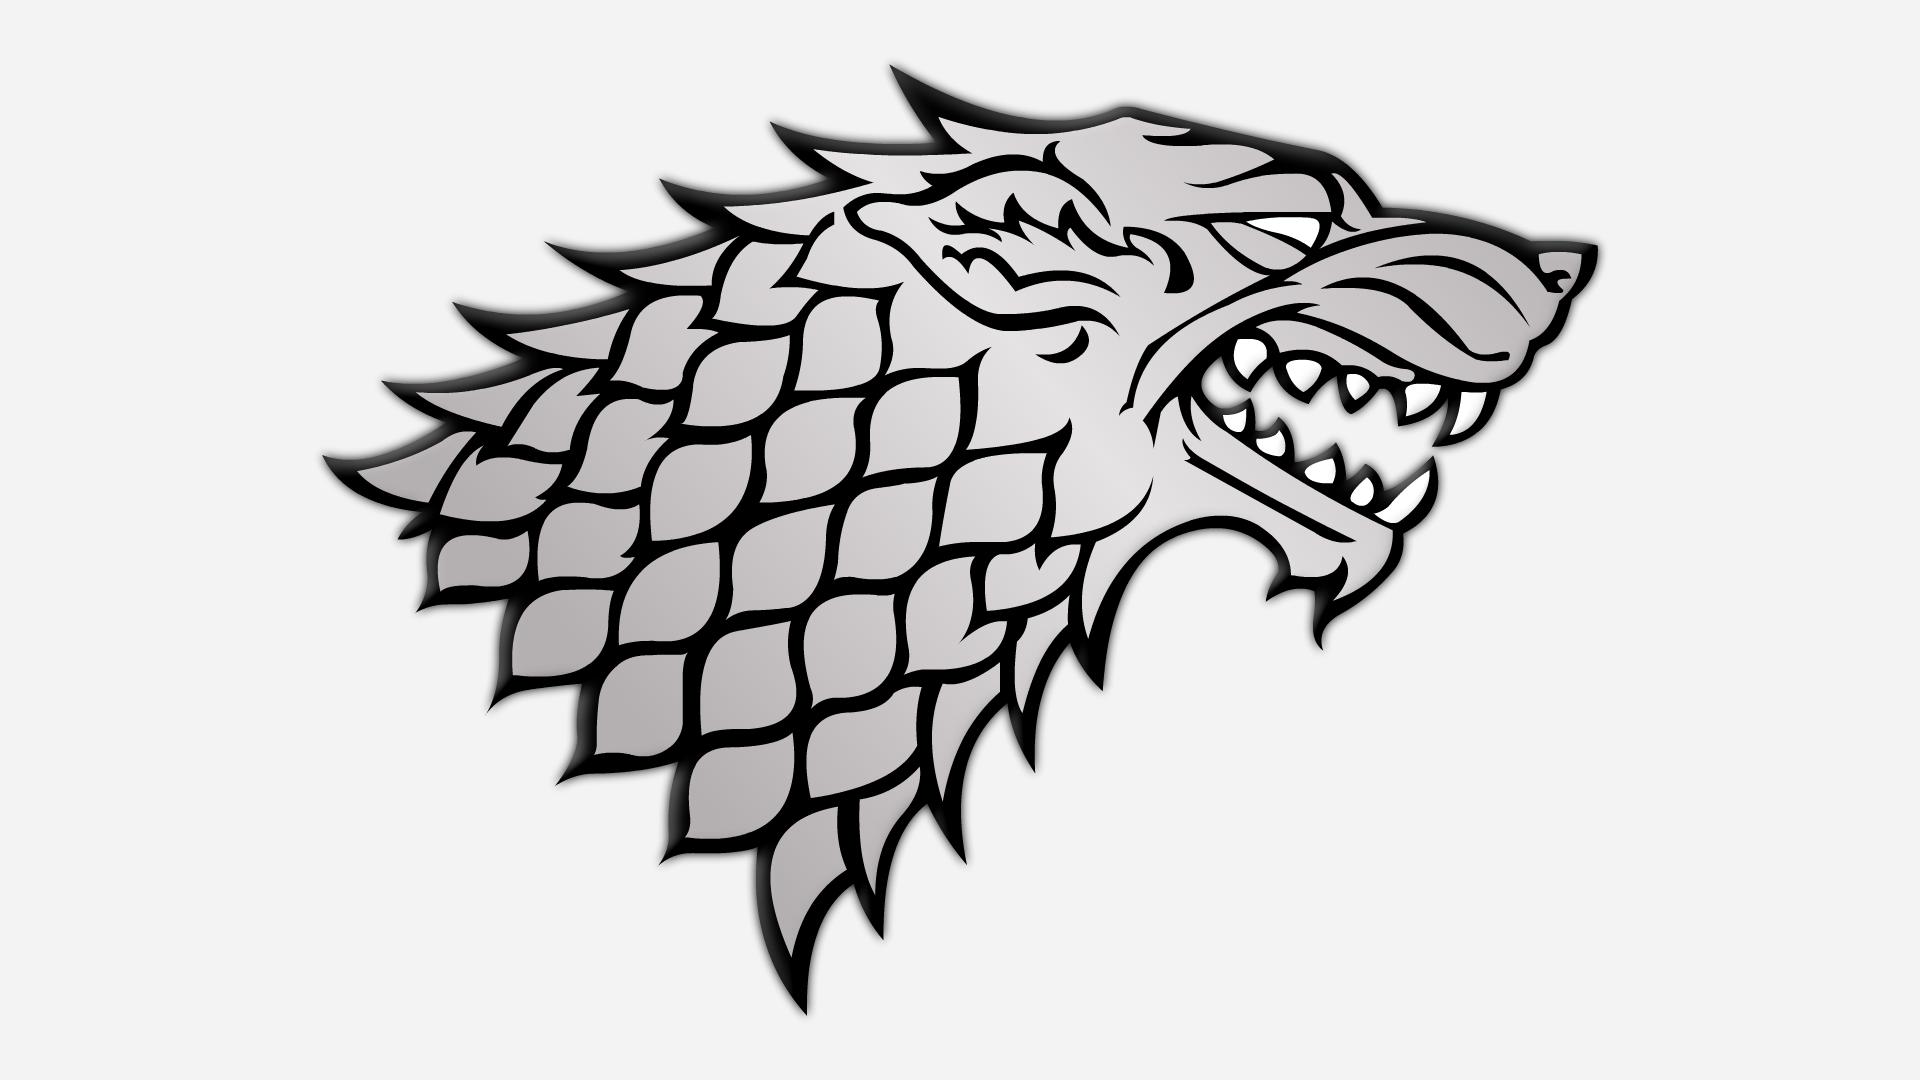 Game Of Thrones Stark Symbol House Stark Symbol By Yurtigo On Deviantart House Stark Sigil Stark Sigil Game Of Thrones Art